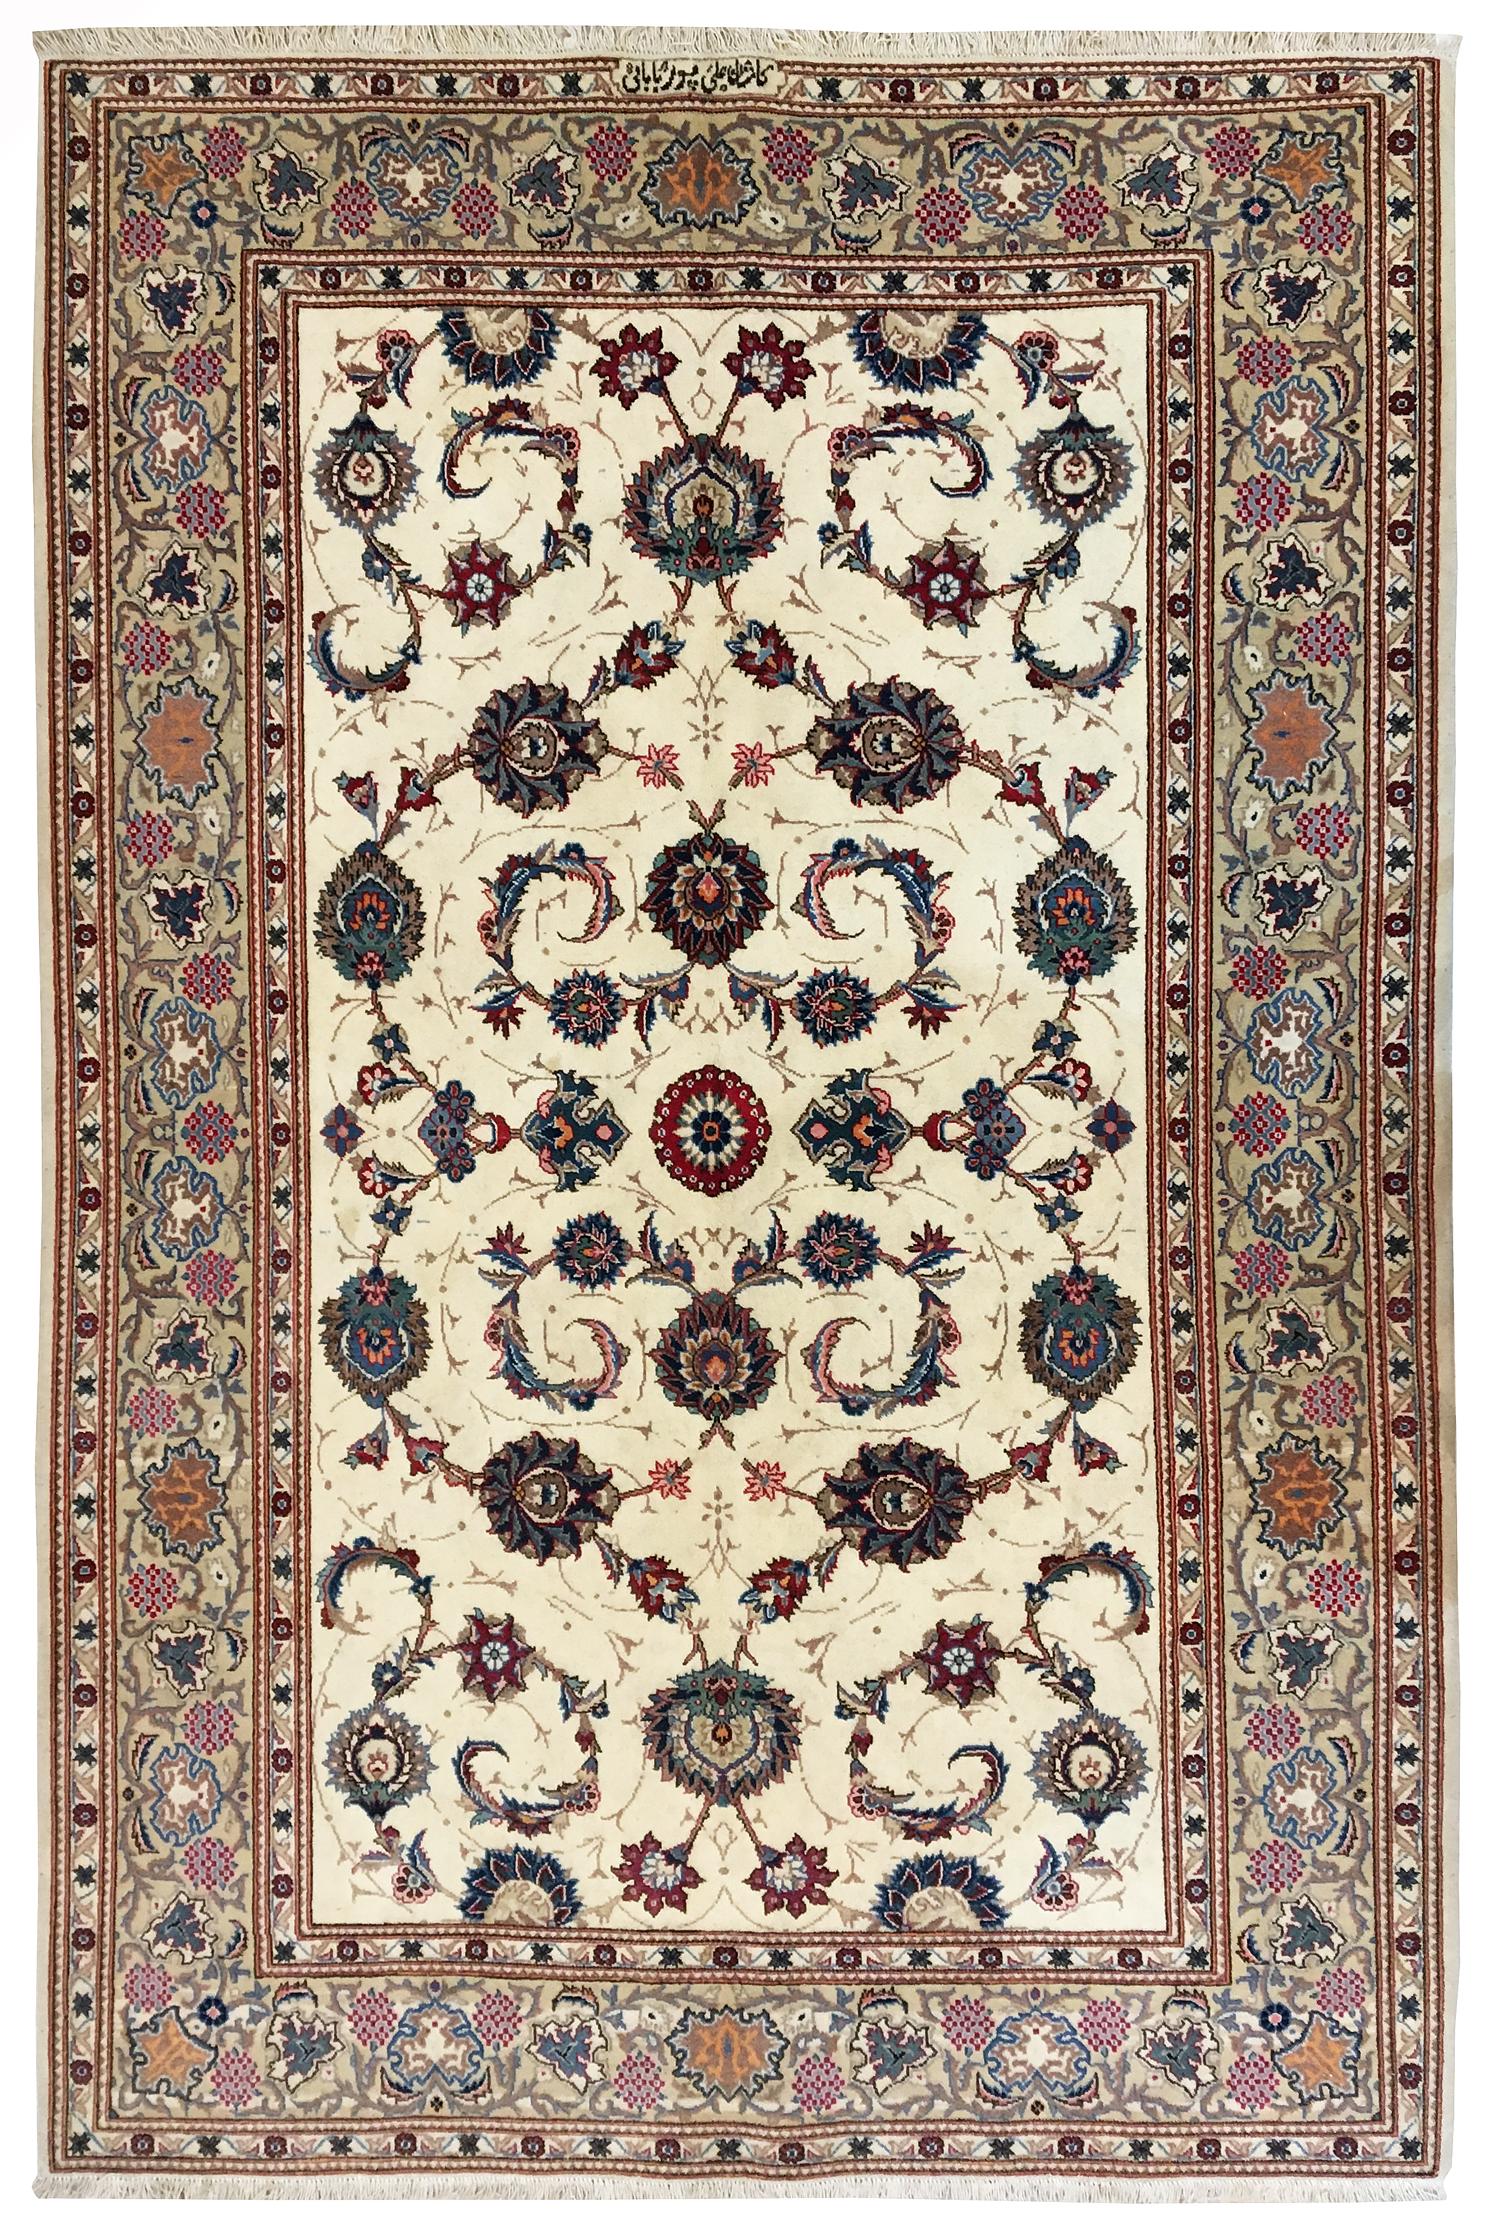 5_Old_Persian_Kashan_Ali-Pour-Baabaei_210cm_x143cm_£4,500_01.jpg